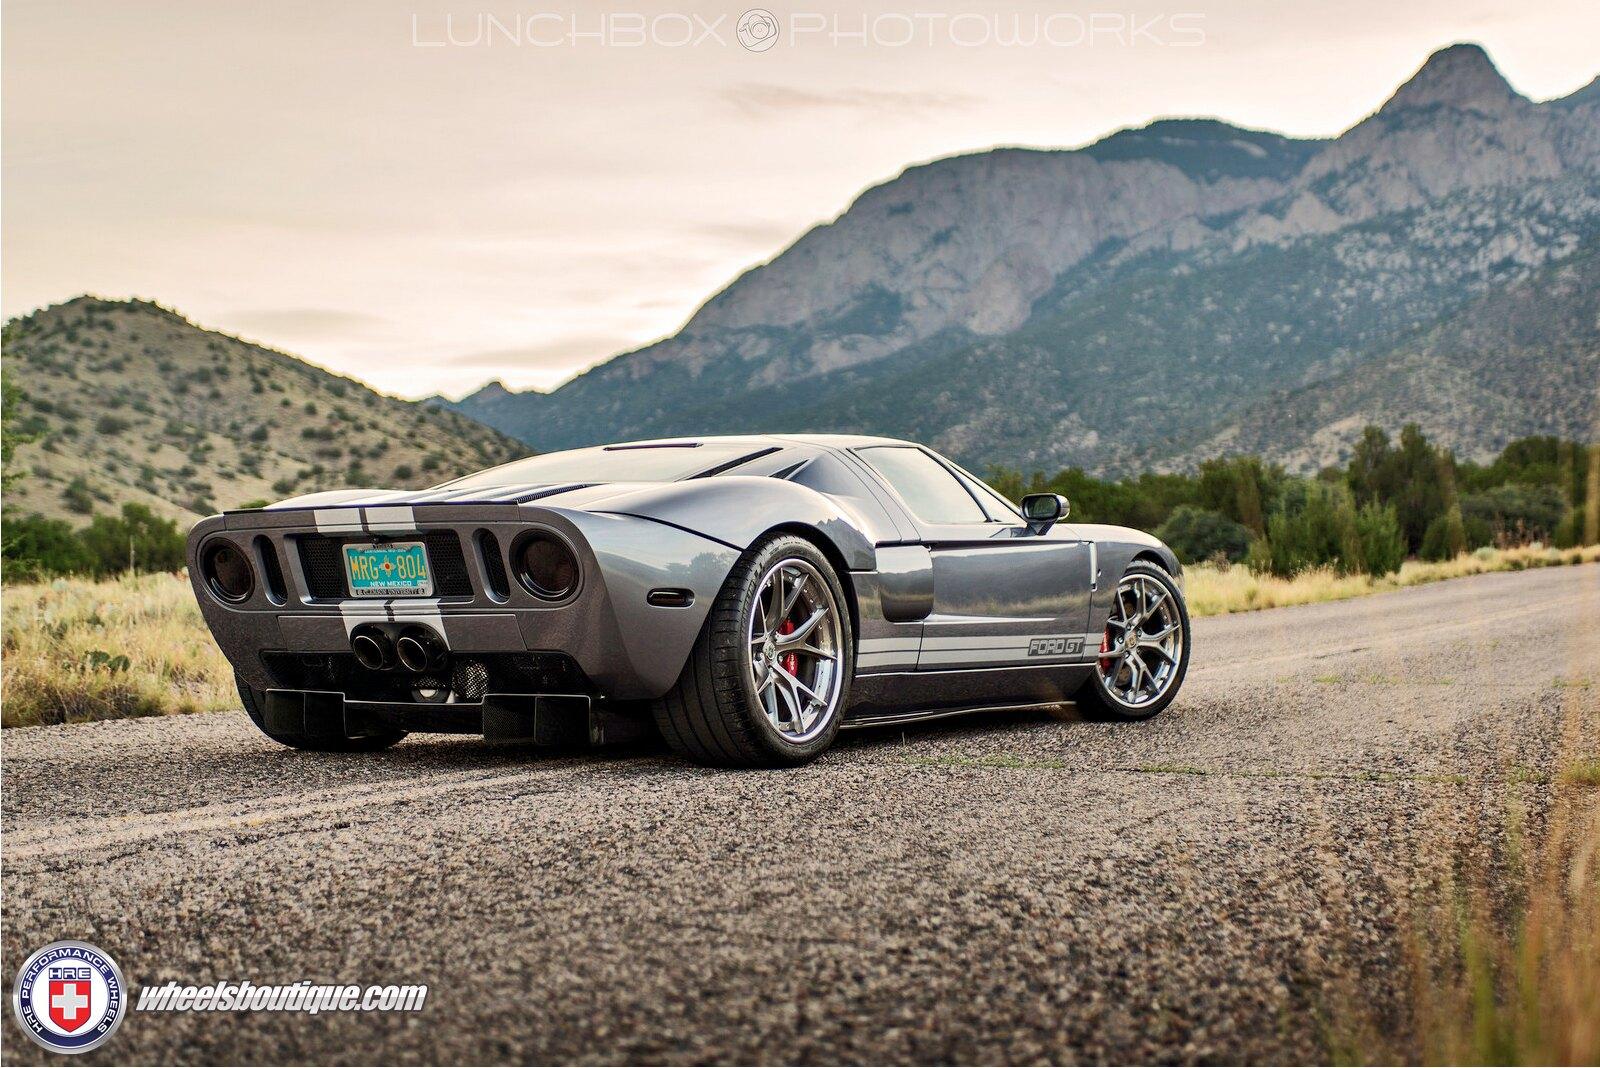 Michelin Pilot Sport >> Wheels Boutique - Ford GT x HRE S101